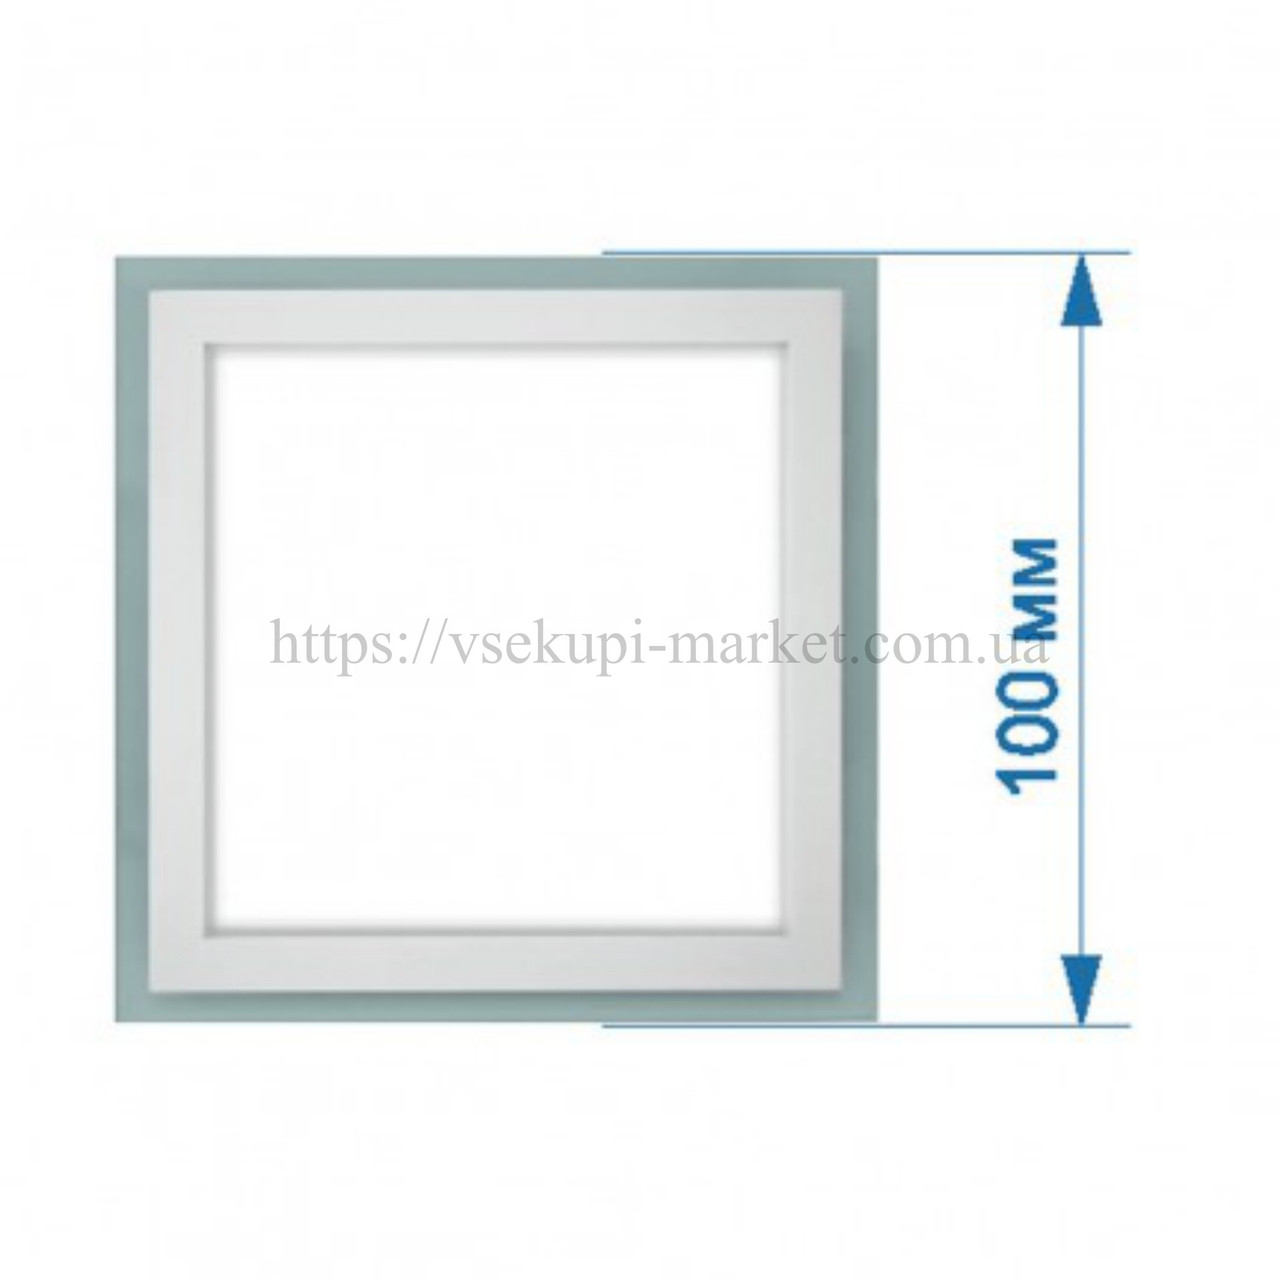 Светильник LED PANEL RIGHT HAUSEN квадрат GLASS (Стеклянный) 6W 4000K HN-233010